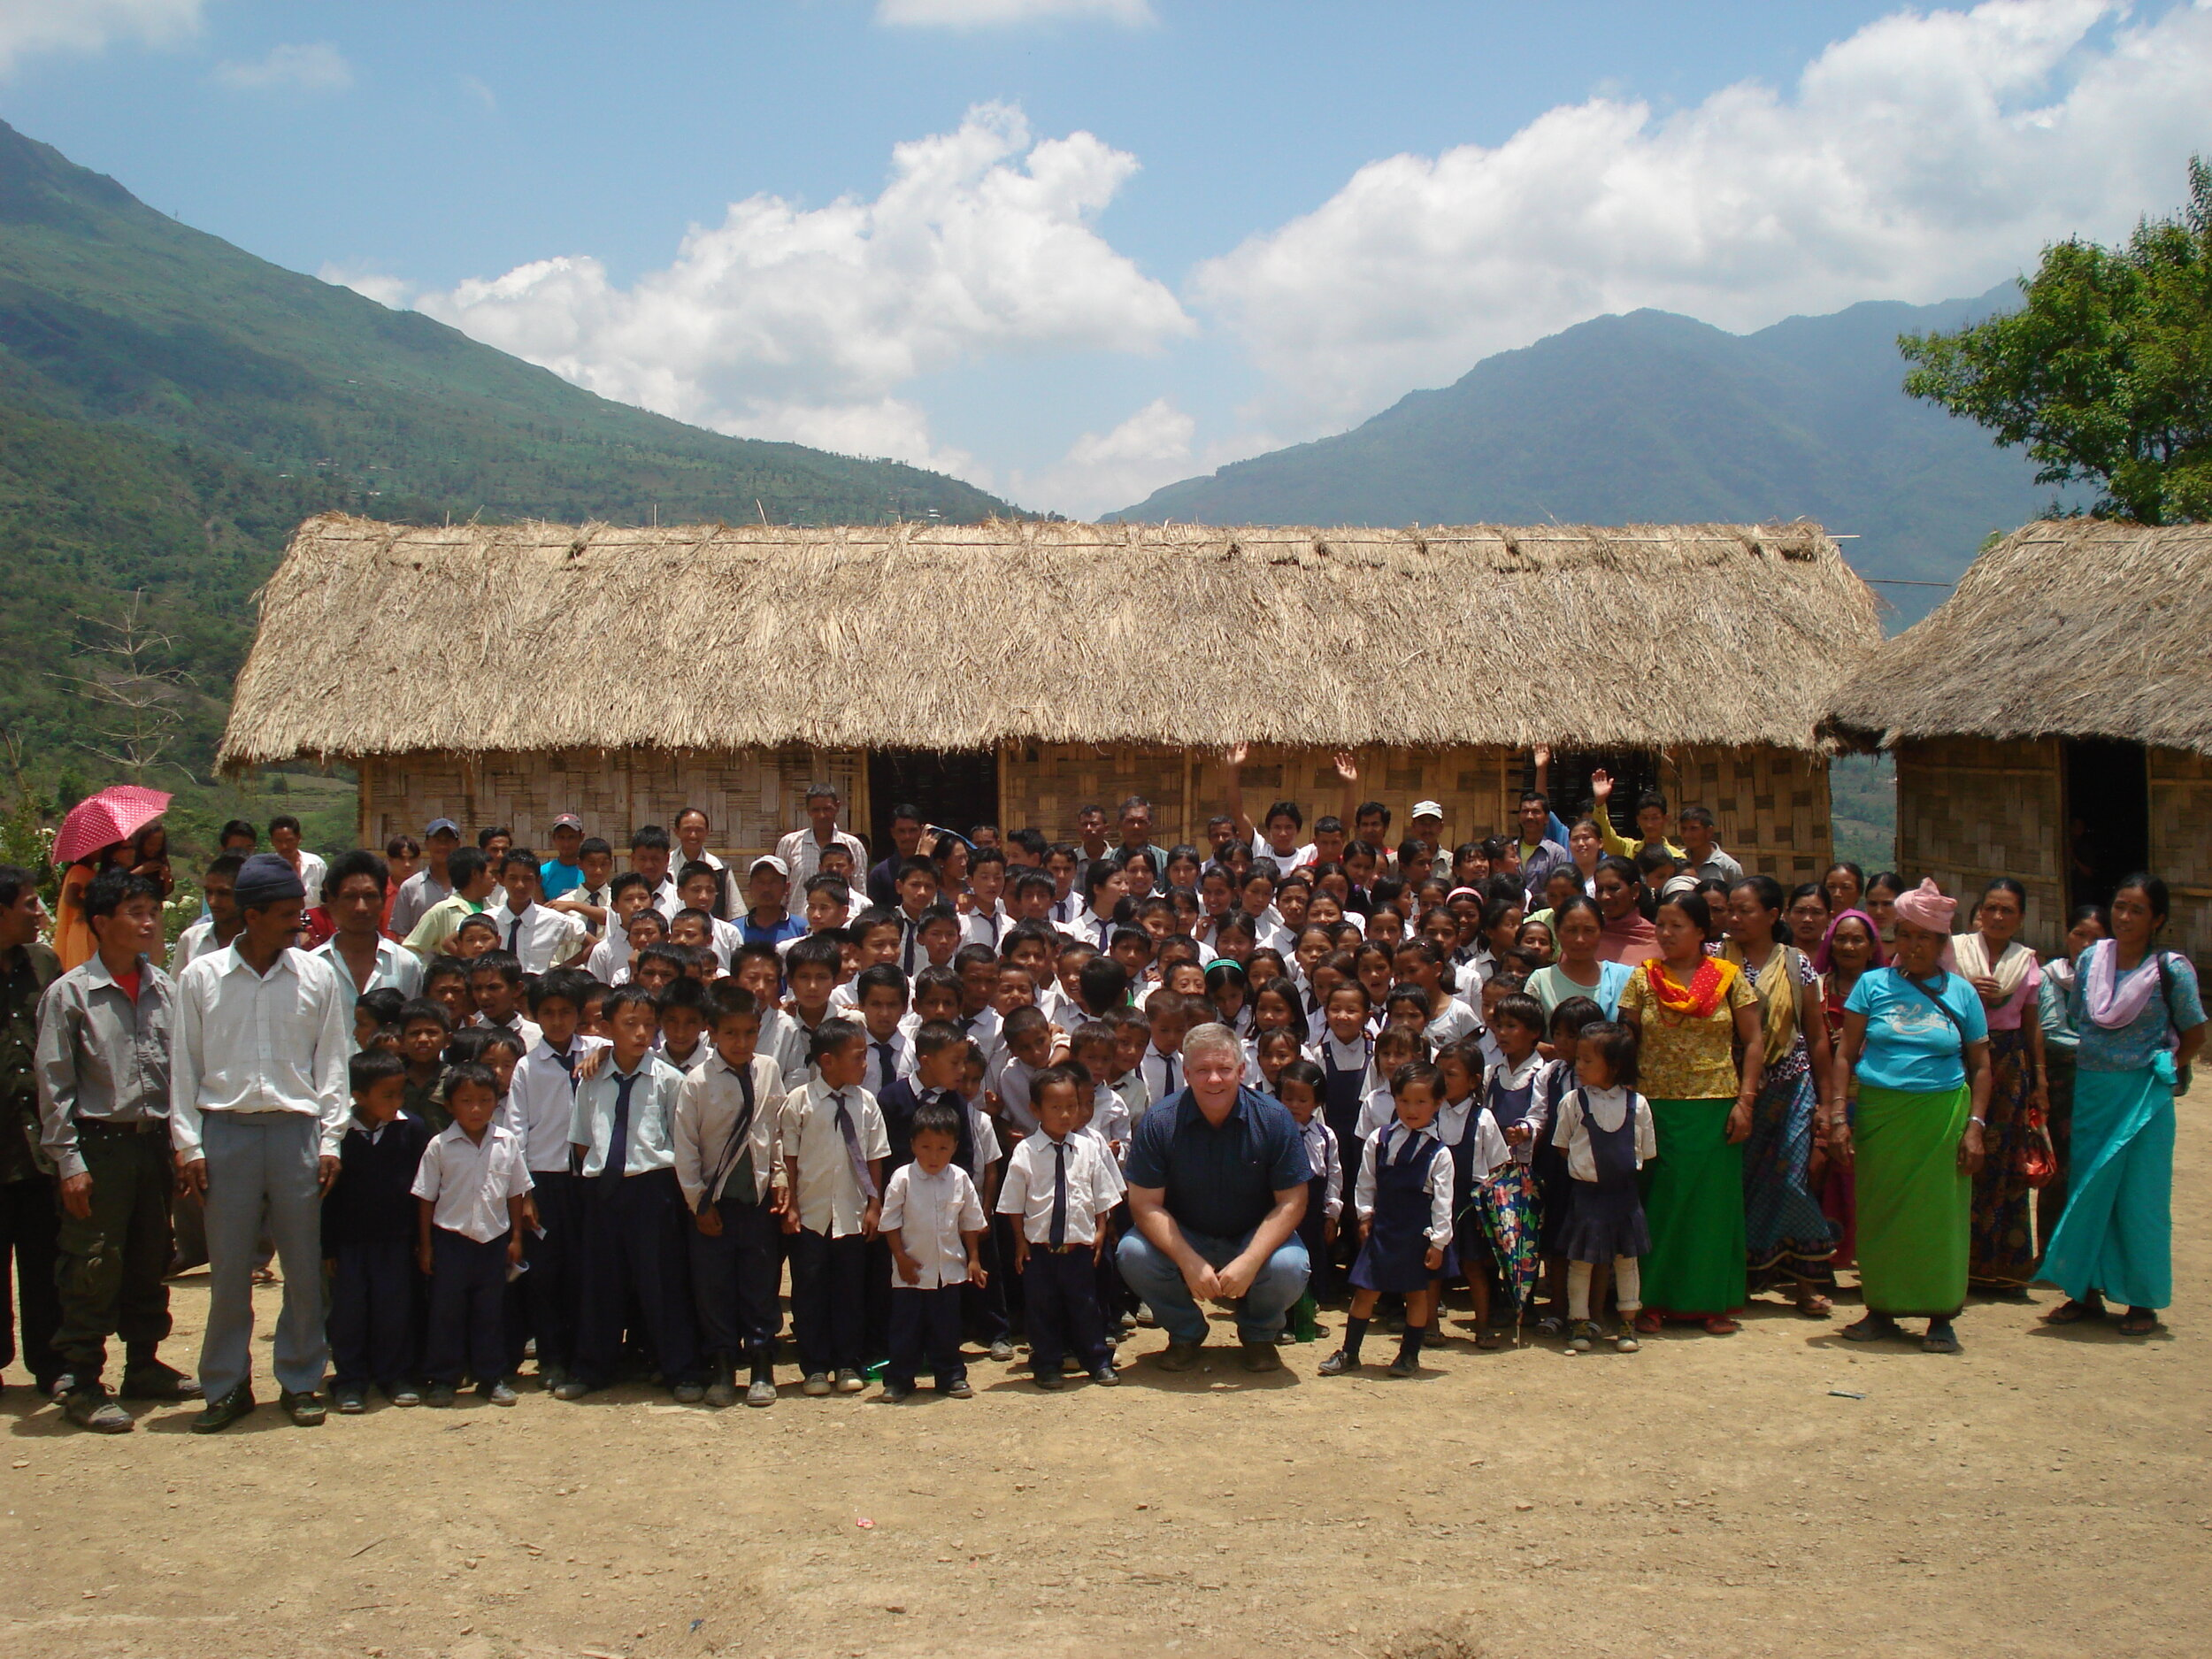 India 2009 022.jpg